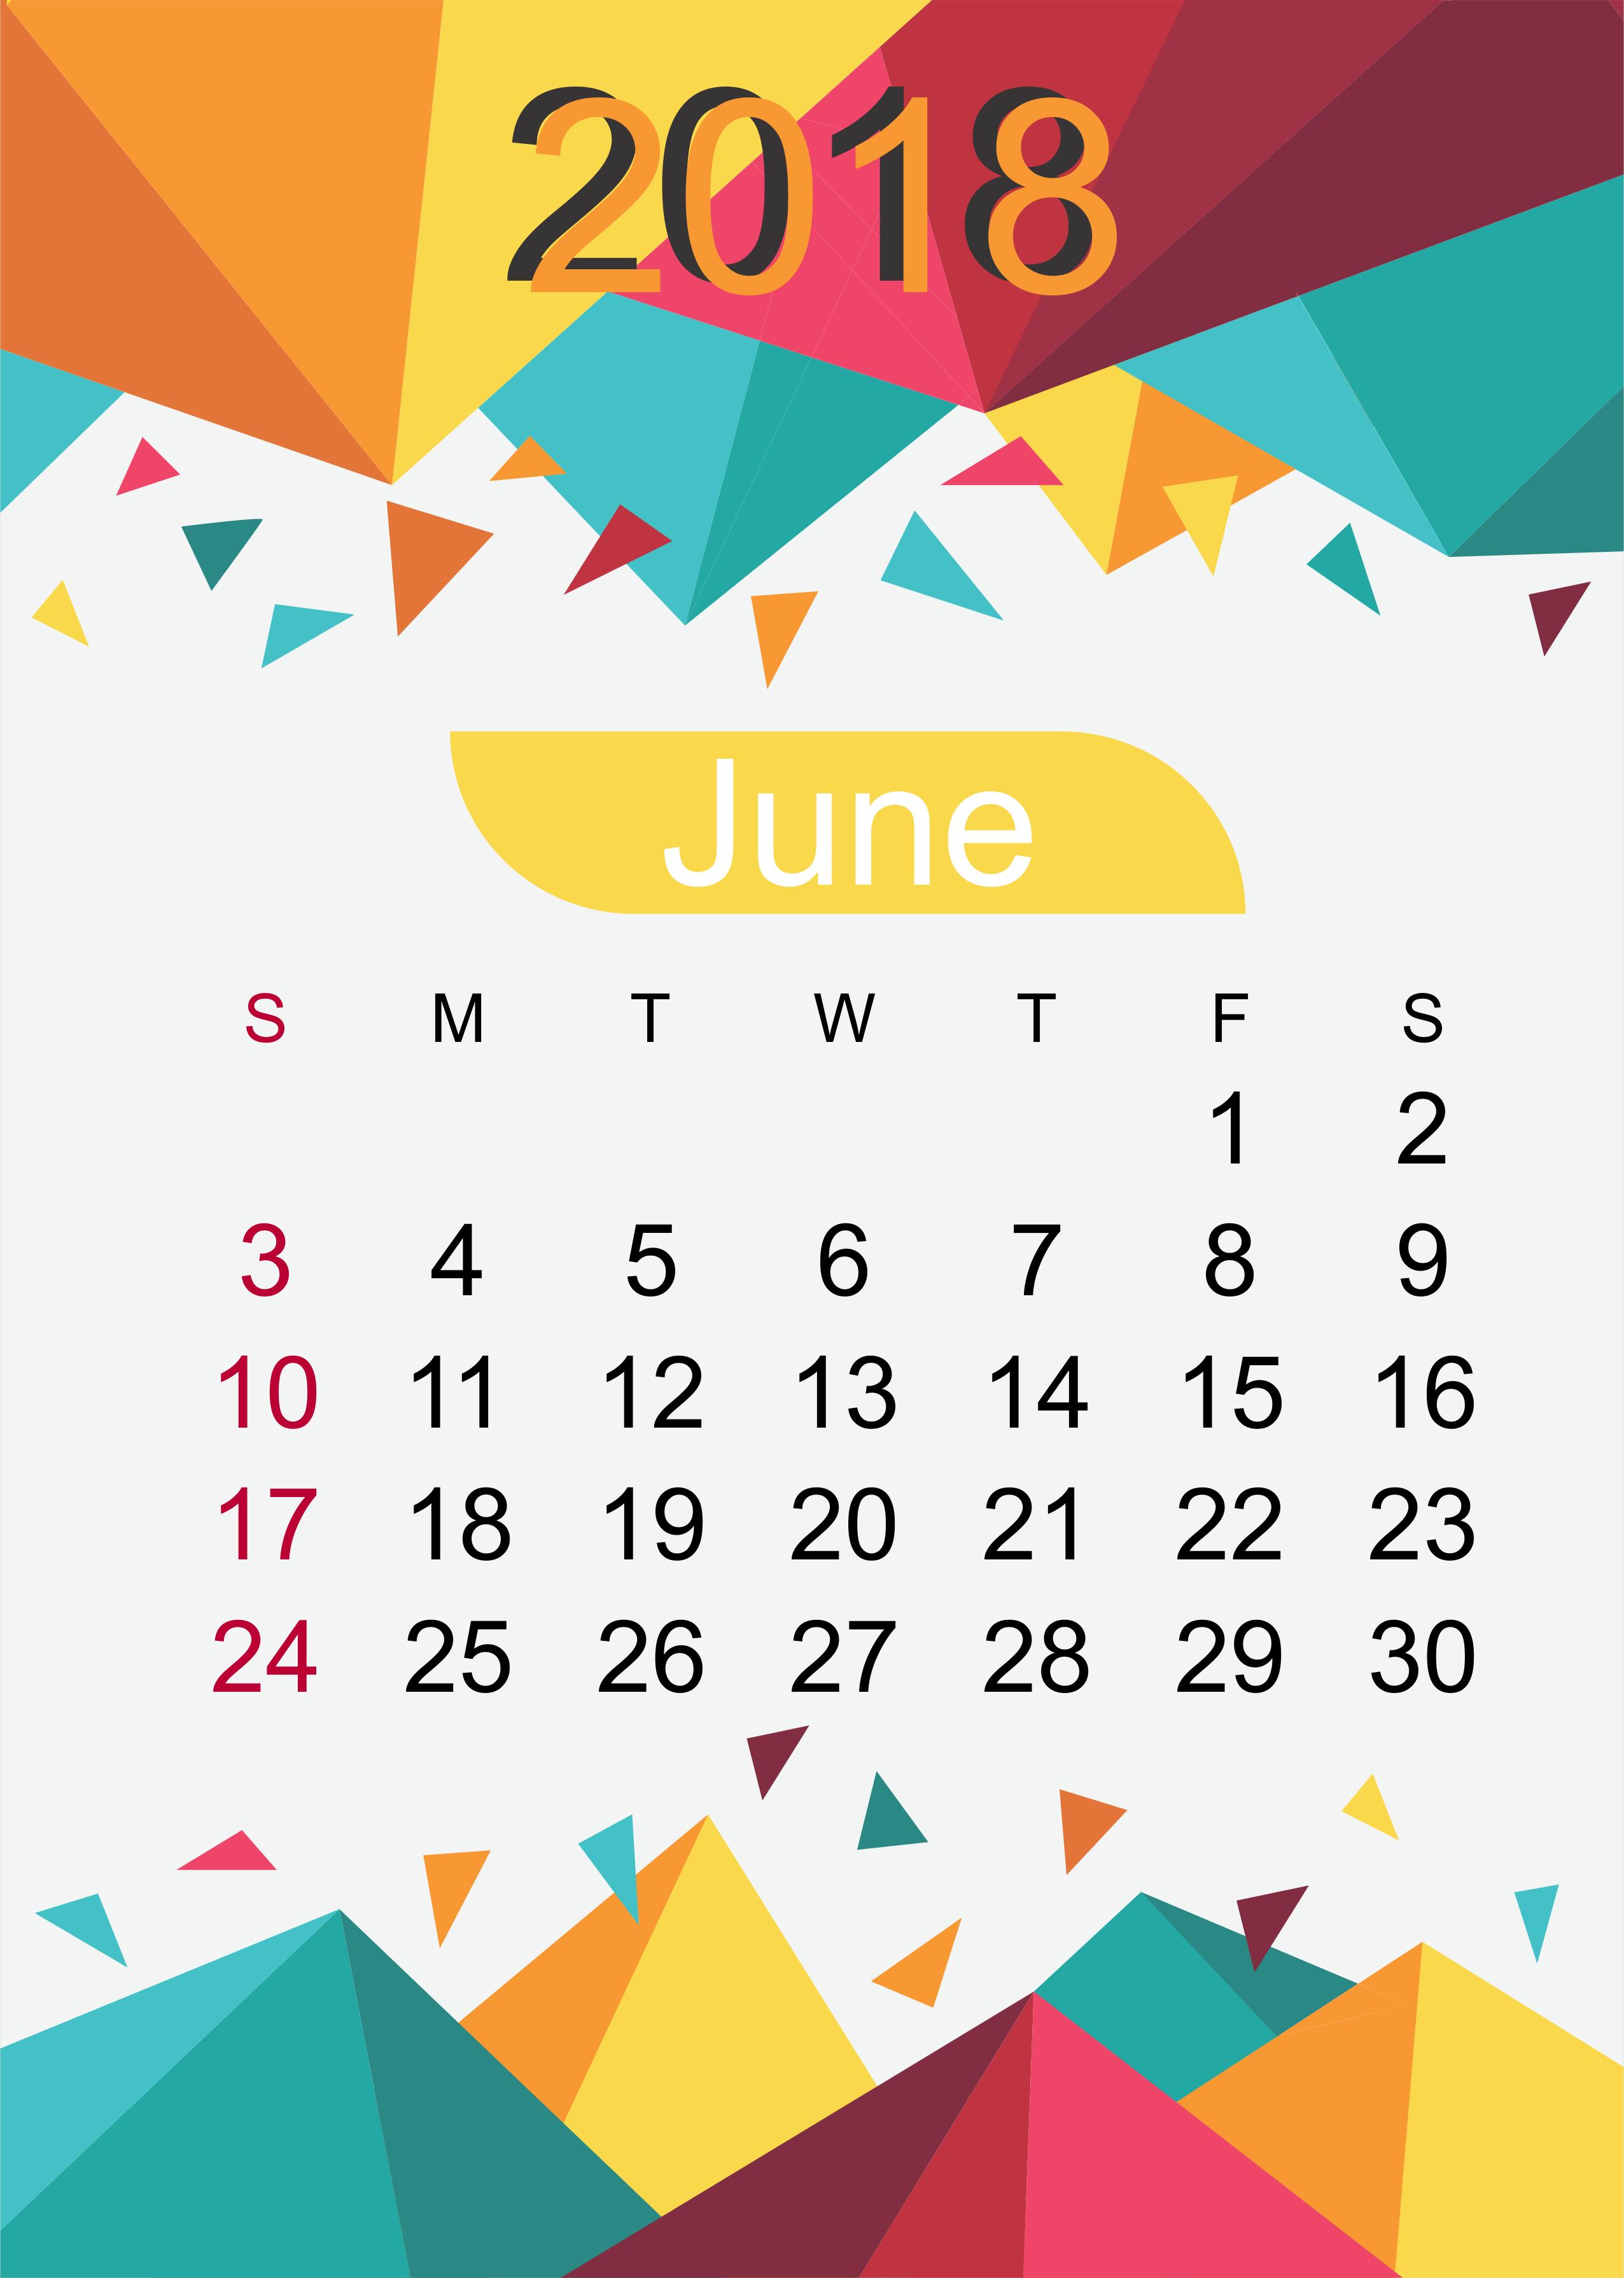 June Calendar Download 2018 Month